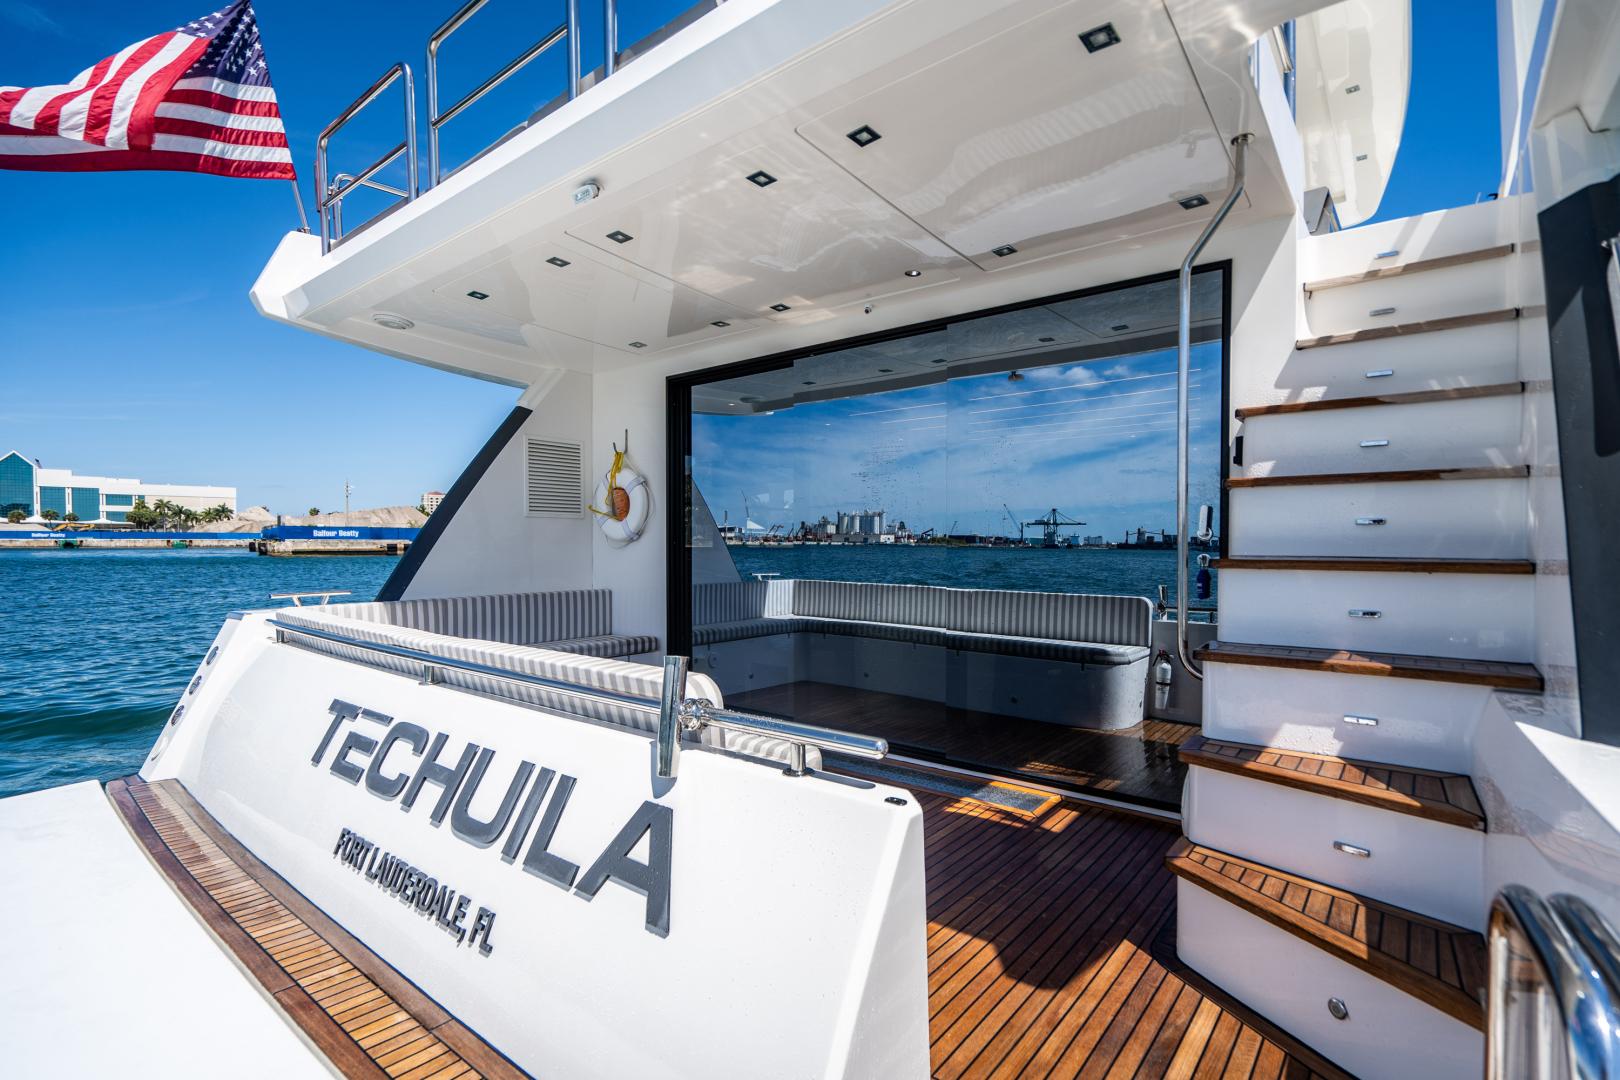 Overblue-58 Power Catamaran 2017-Techuila Ft. Lauderdale-Florida-United States-2017 Overblue 58 Powercat-1401167   Thumbnail